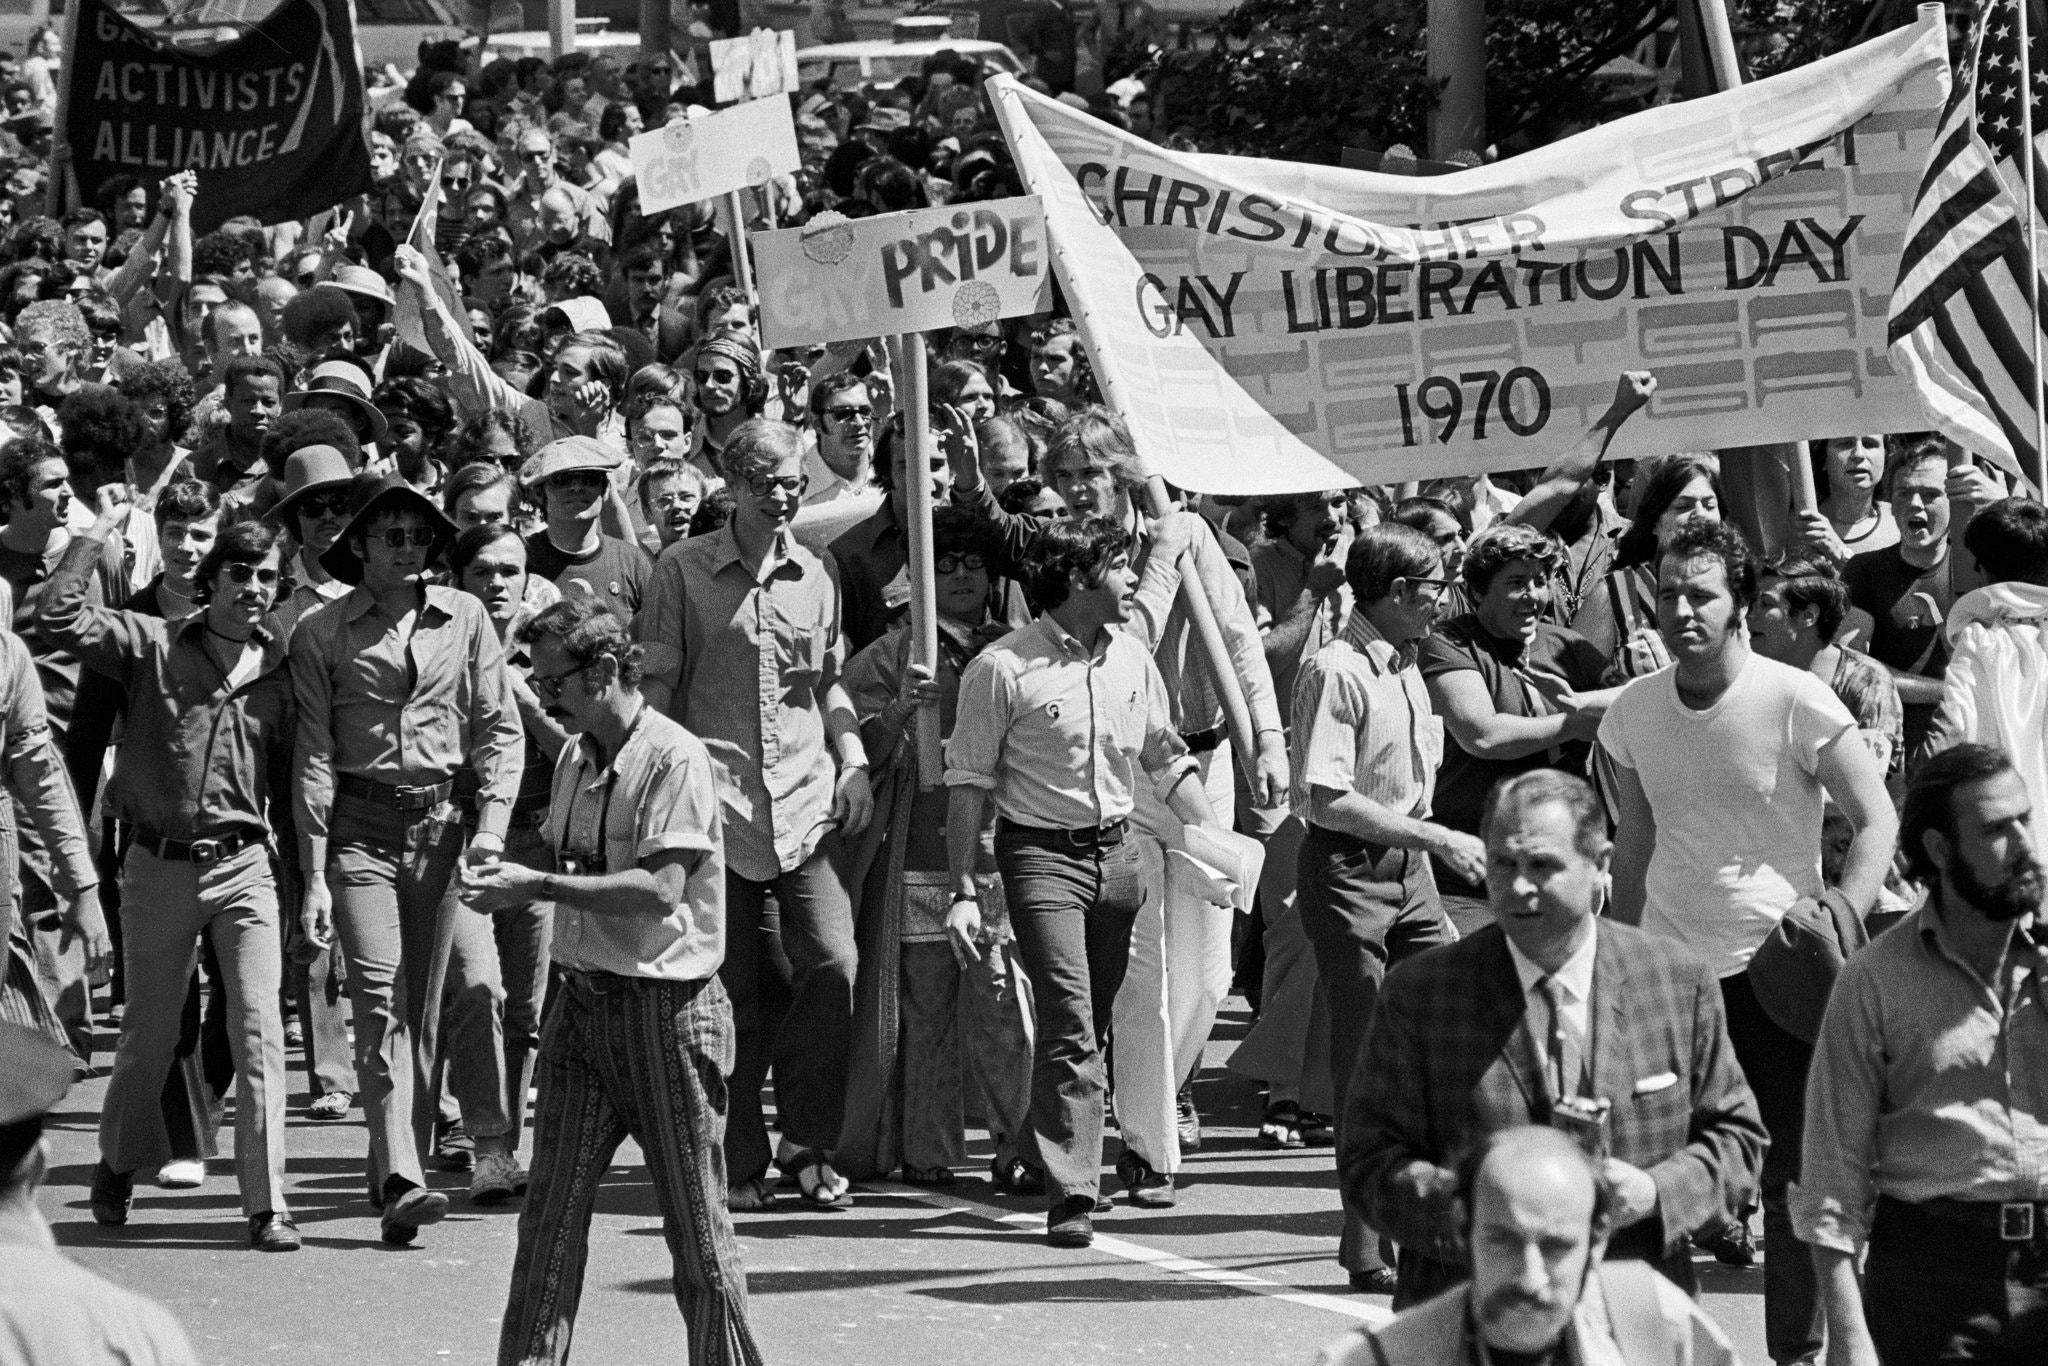 Stonewall Inn Uprising: 50 years